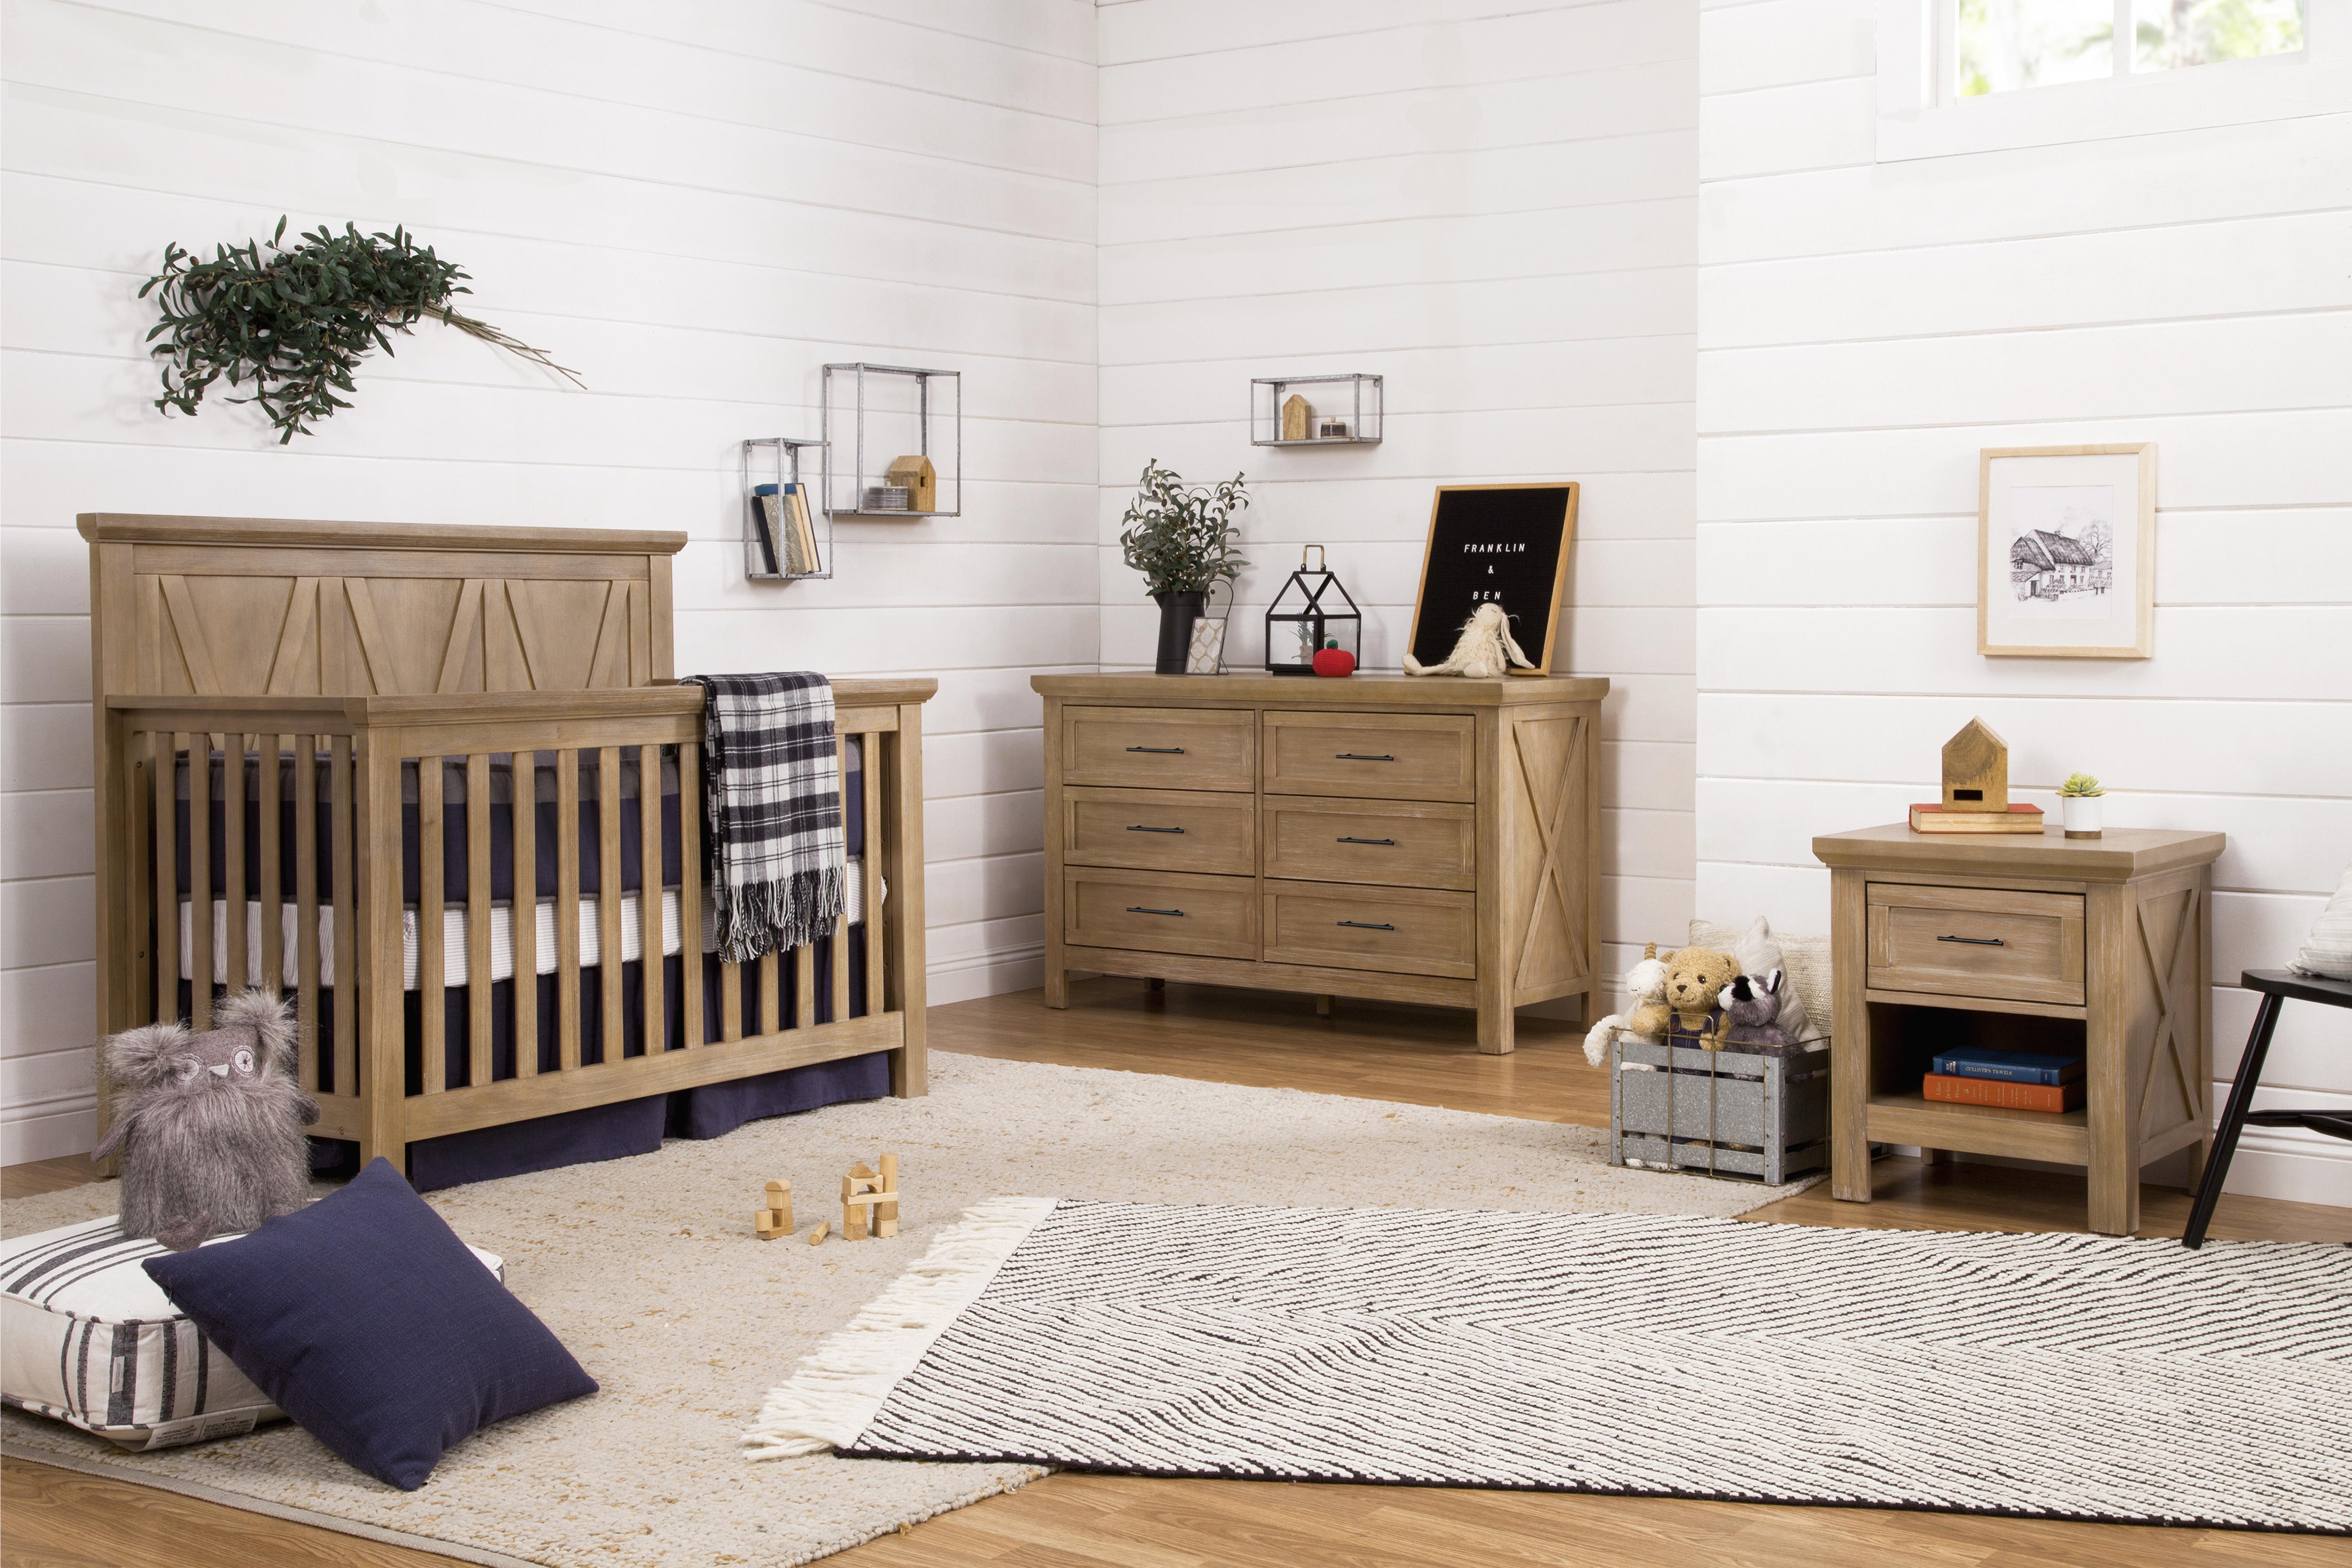 Kids N Cribs Bay Area Baby U0026 Kids Store    Quality Baby U0026 Kids Furniture  Store In Pleasant Hill, CA